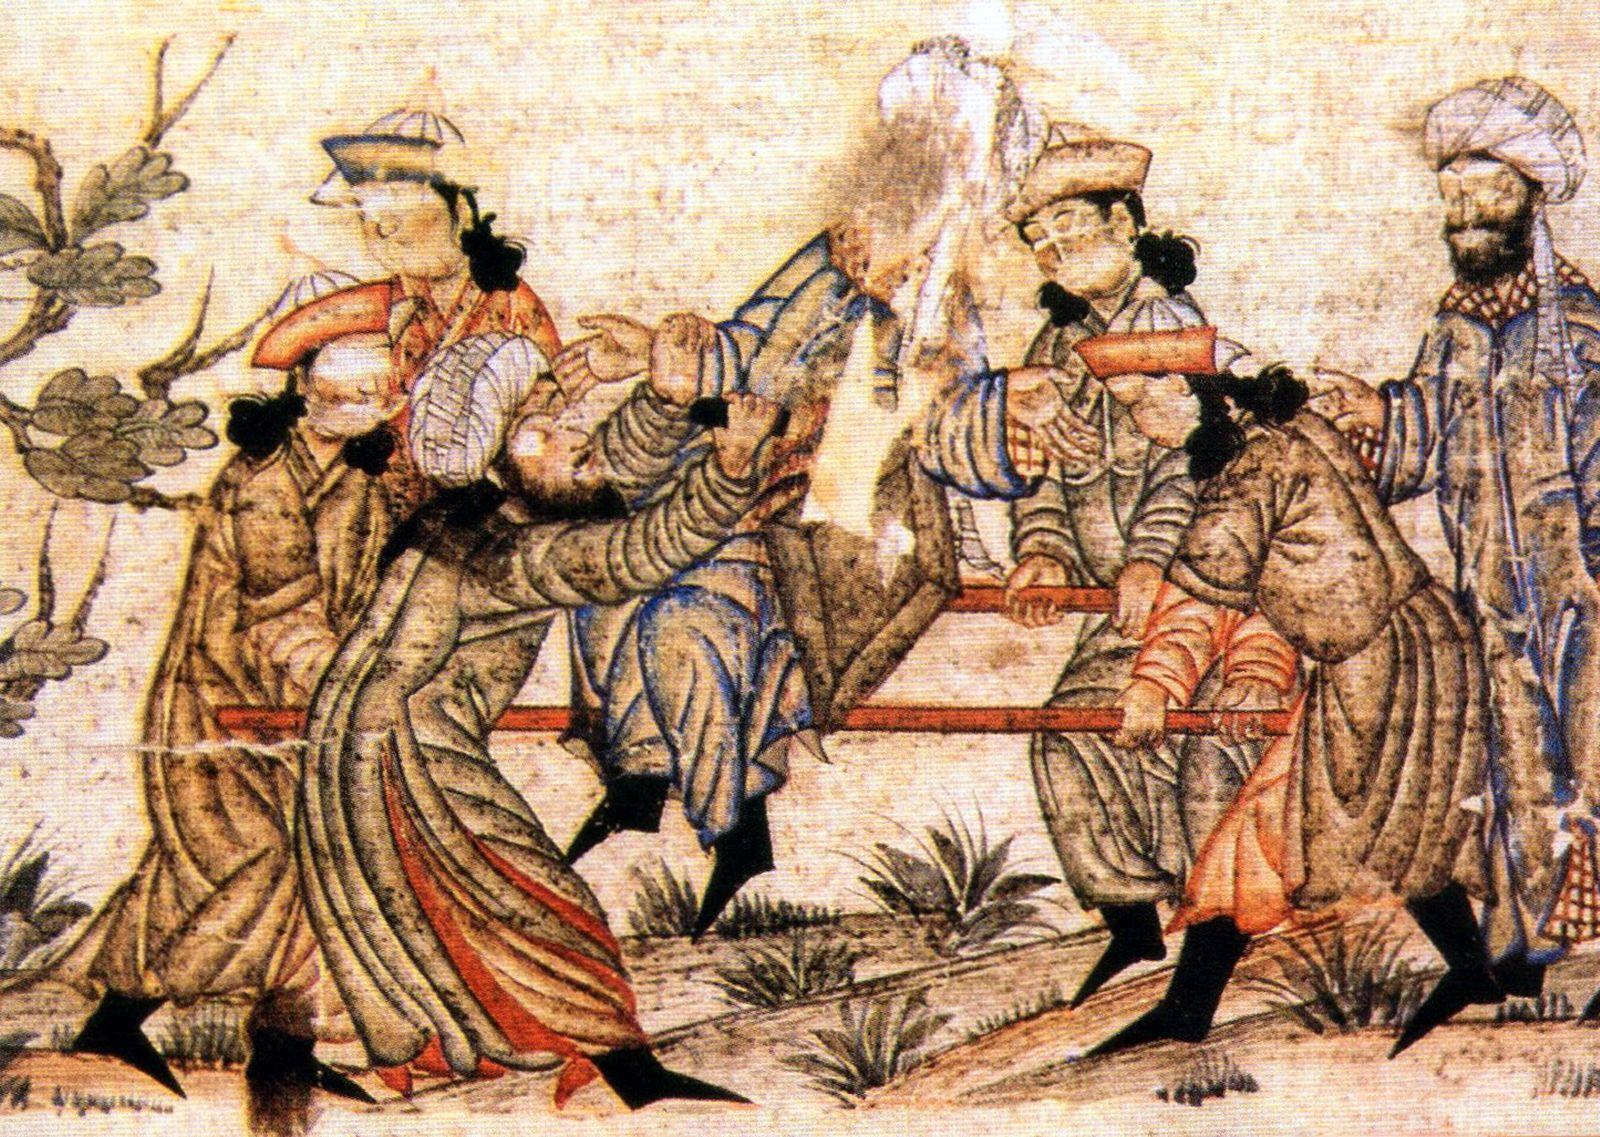 Iran / Persia: The assassination of Nizam al-Mulk by an assassin of Hassan-i-Sabbah, 1092 CE. Miniature at the Topkapi Palace, Istanbul, Turkey.